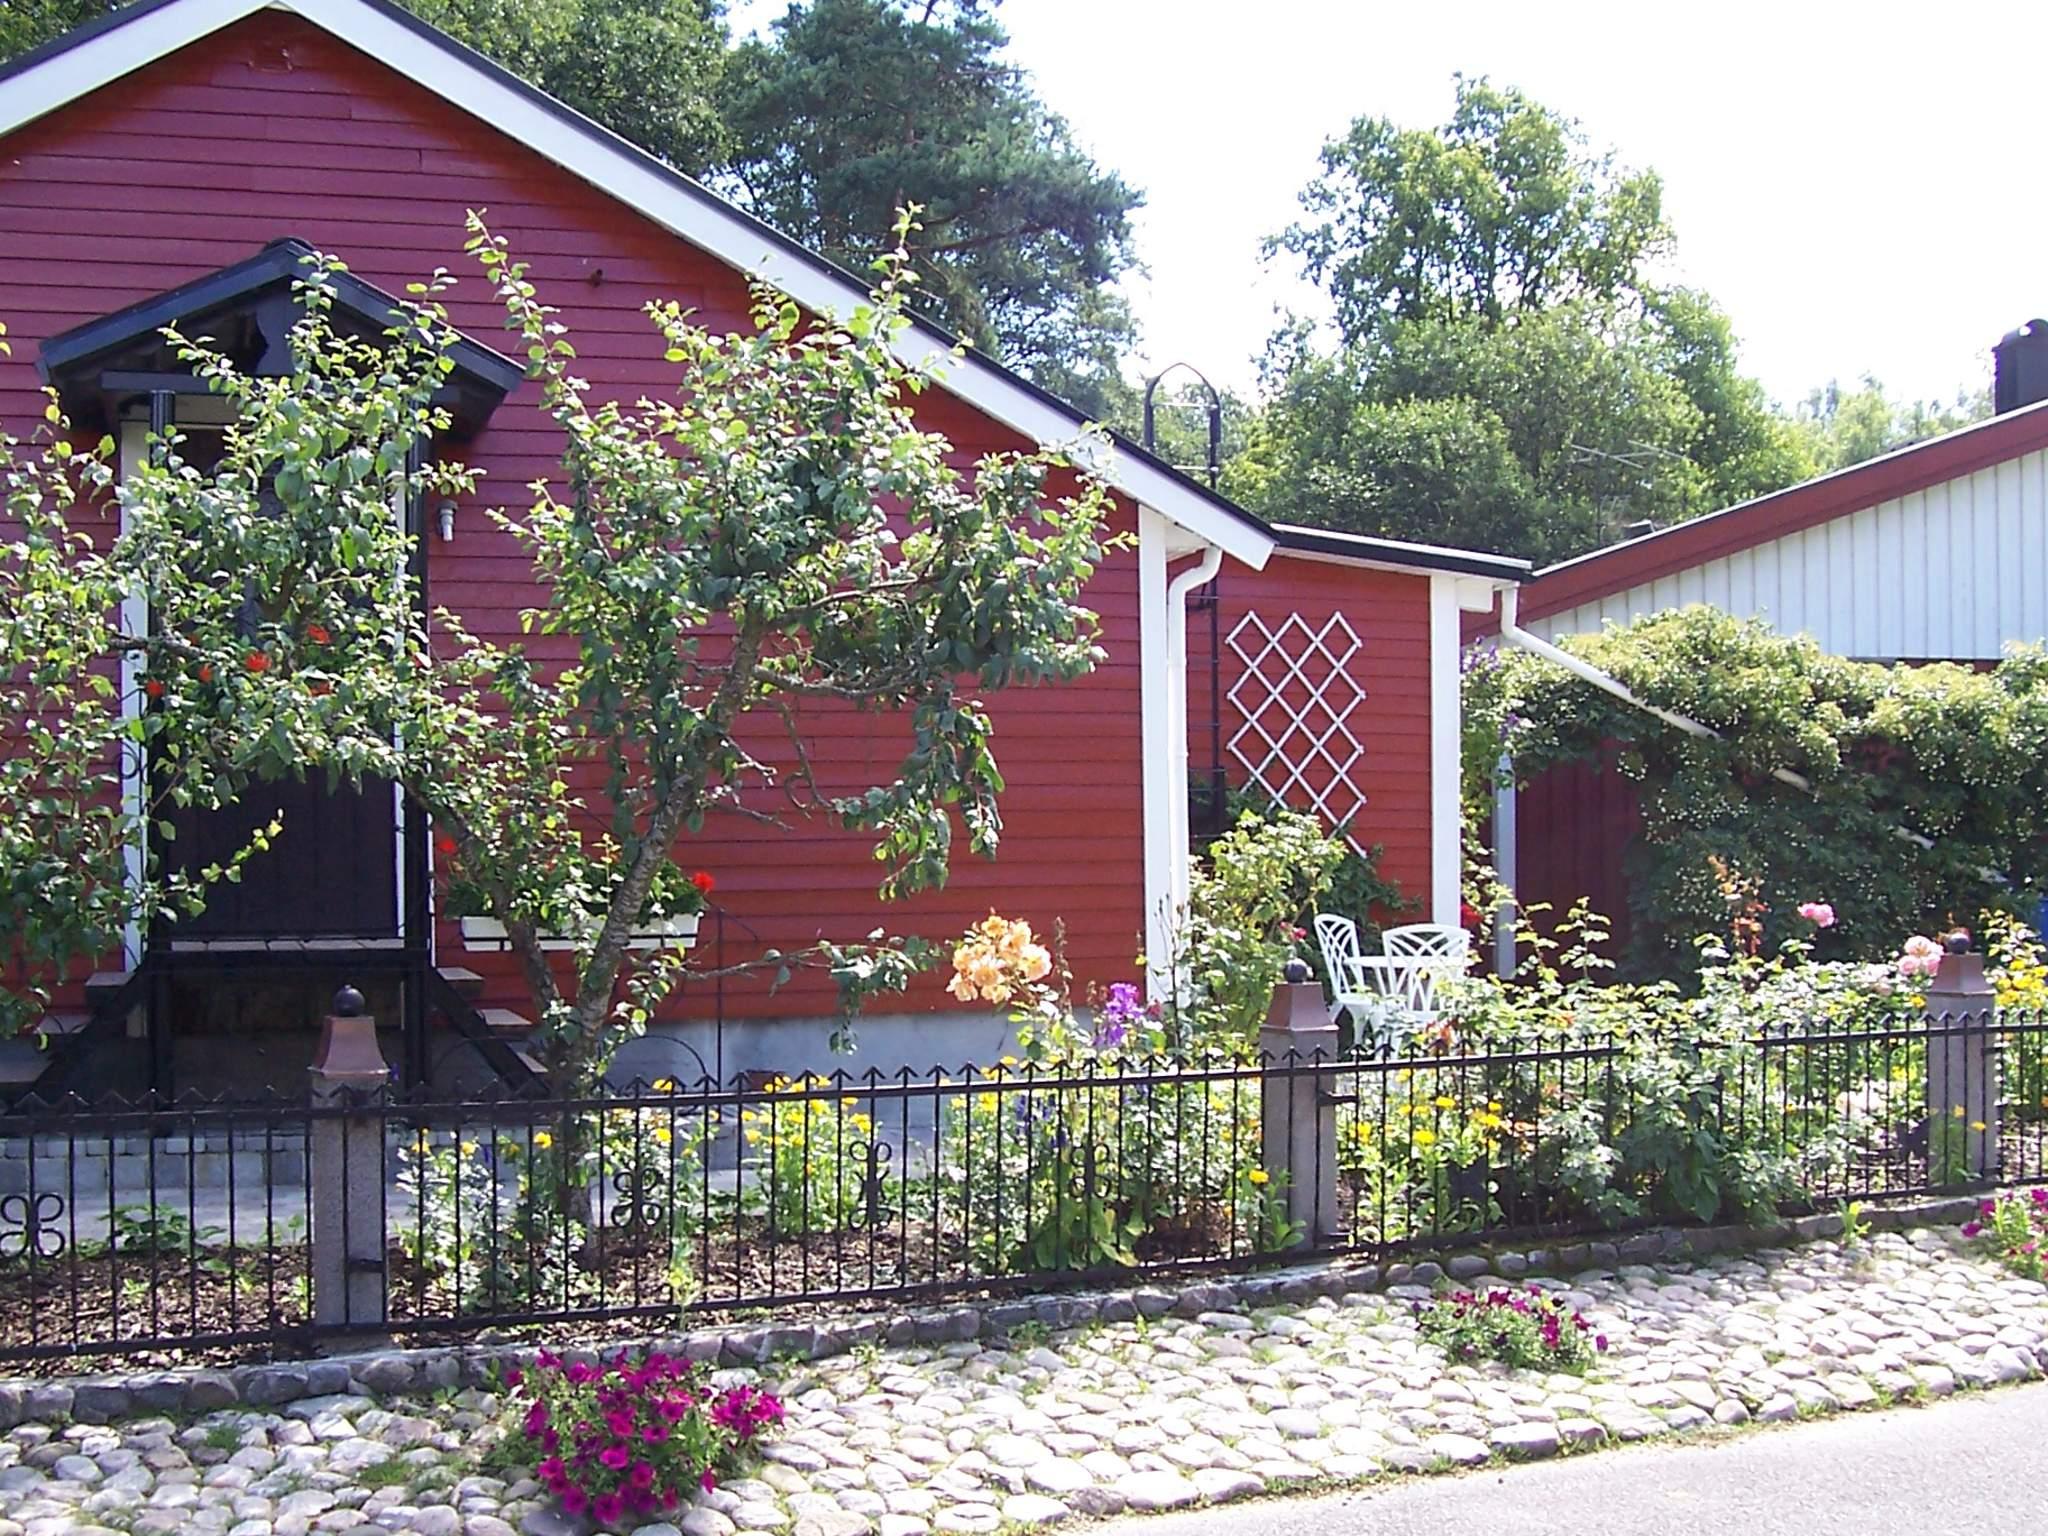 Ferienhaus Finjasjön (86936), Hässleholm, Skane län, Südschweden, Schweden, Bild 17